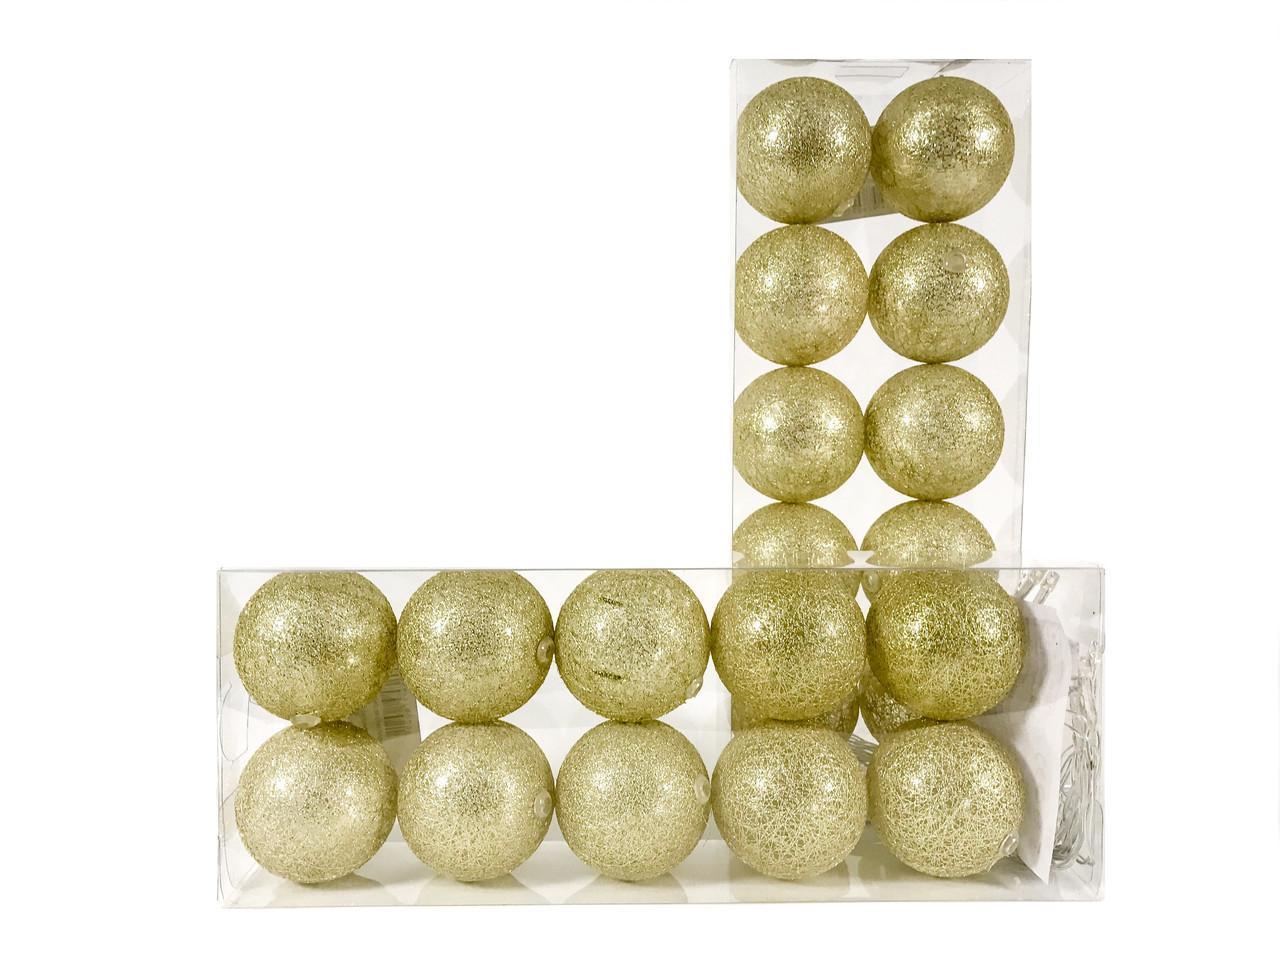 Гирлянда тайские шарики Decorino Golden Cotton Balls 10led, диам 6см, длина 235см на батарейках АА